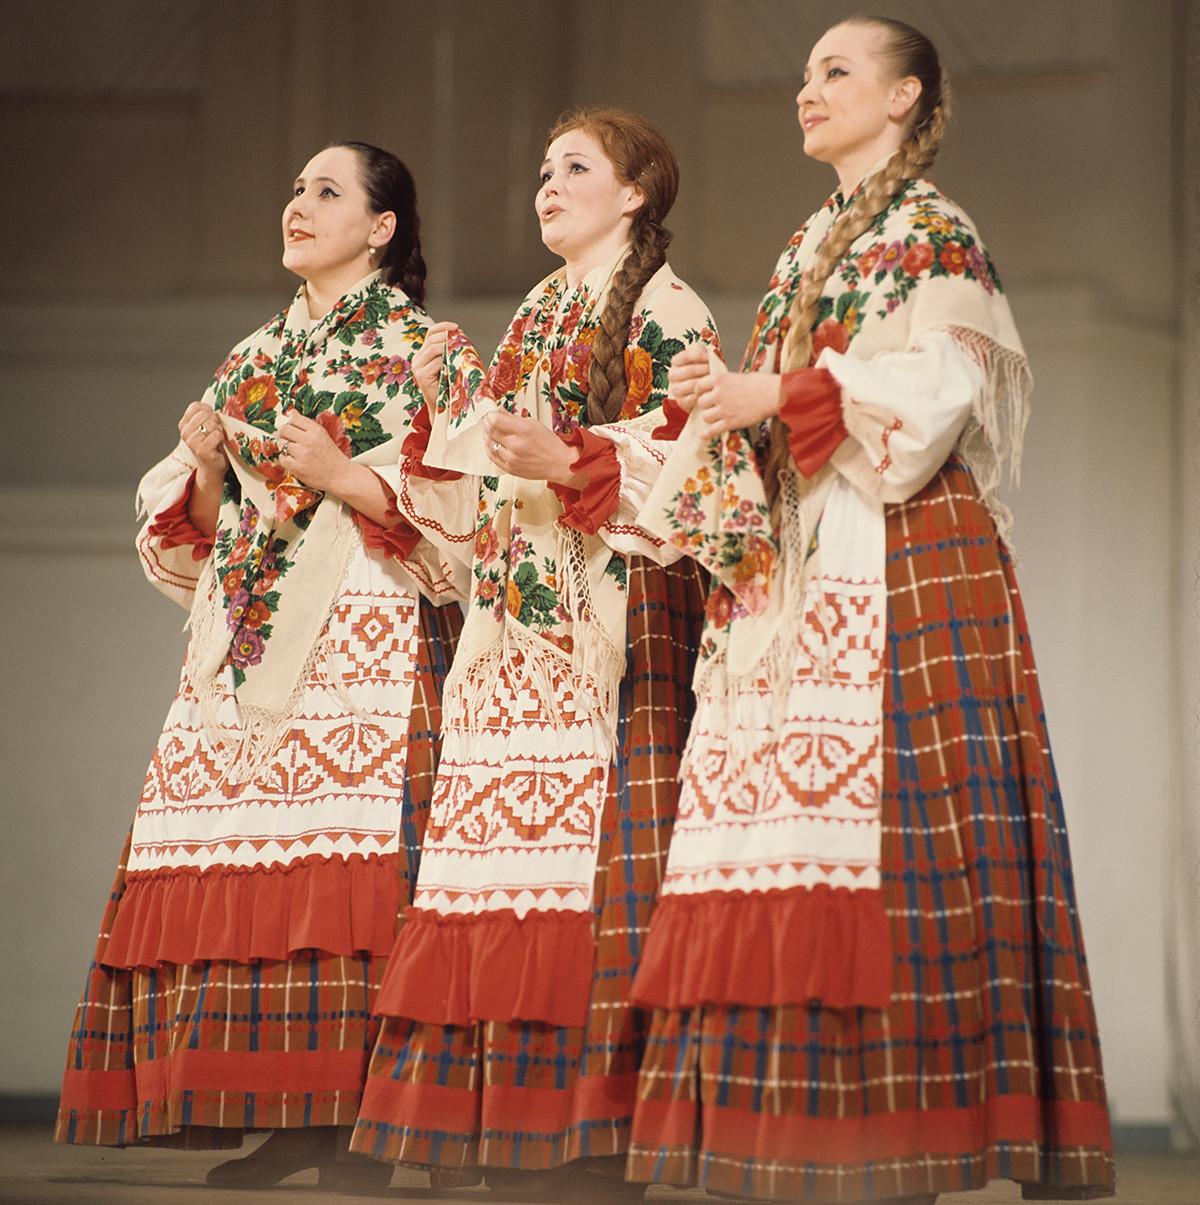 Chœur traditionnel russe, 1970